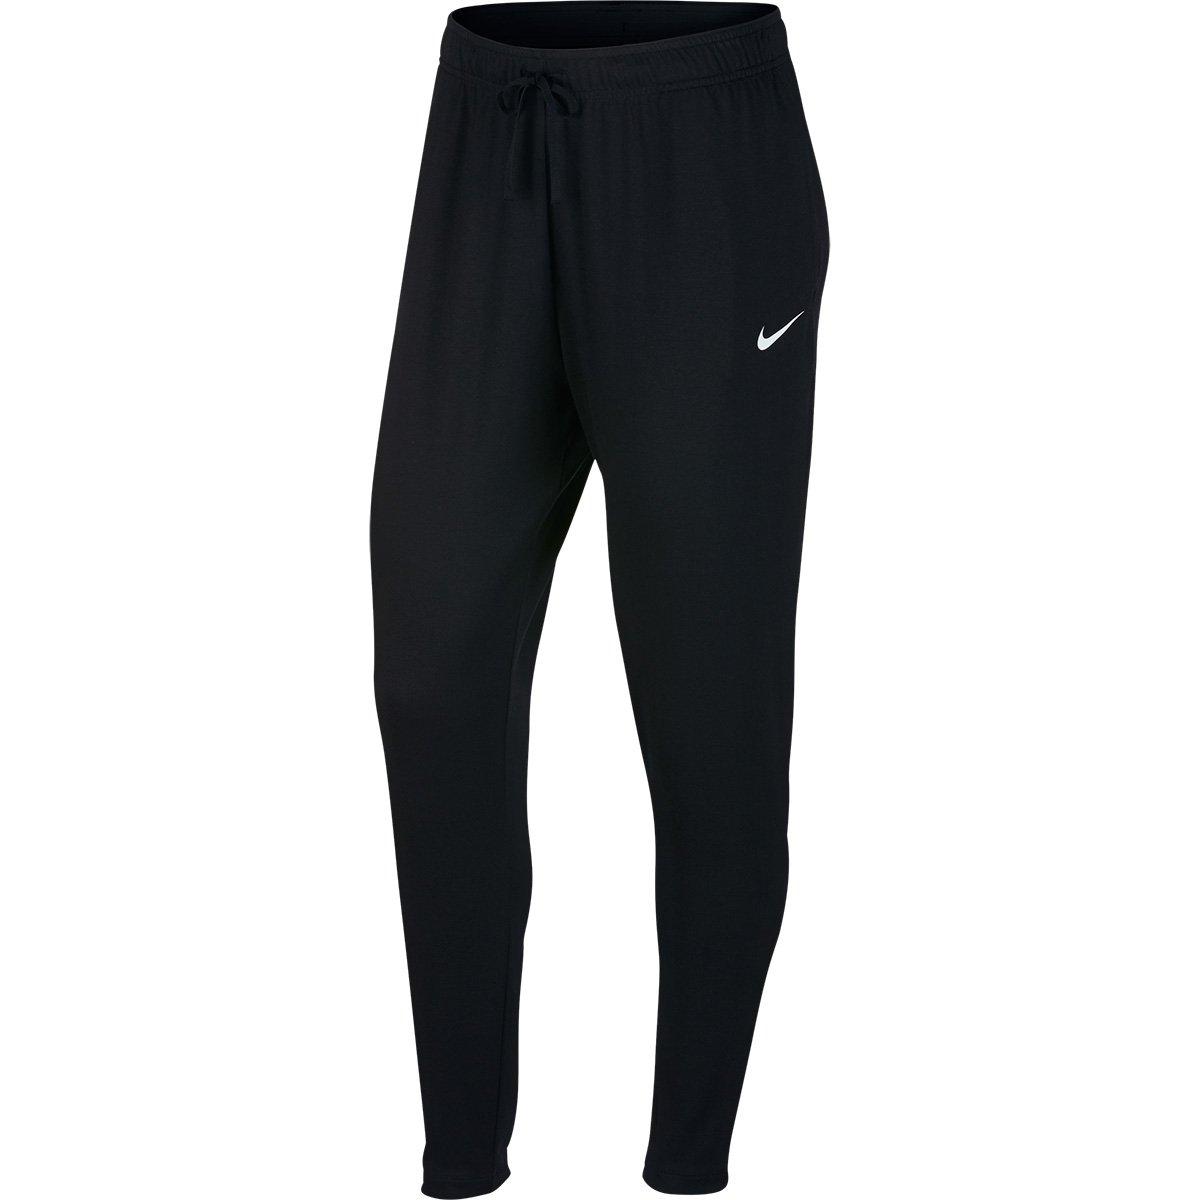 Flow Calça Calça Preto e Victory Feminina Branco Nike Nike w1RxtR7